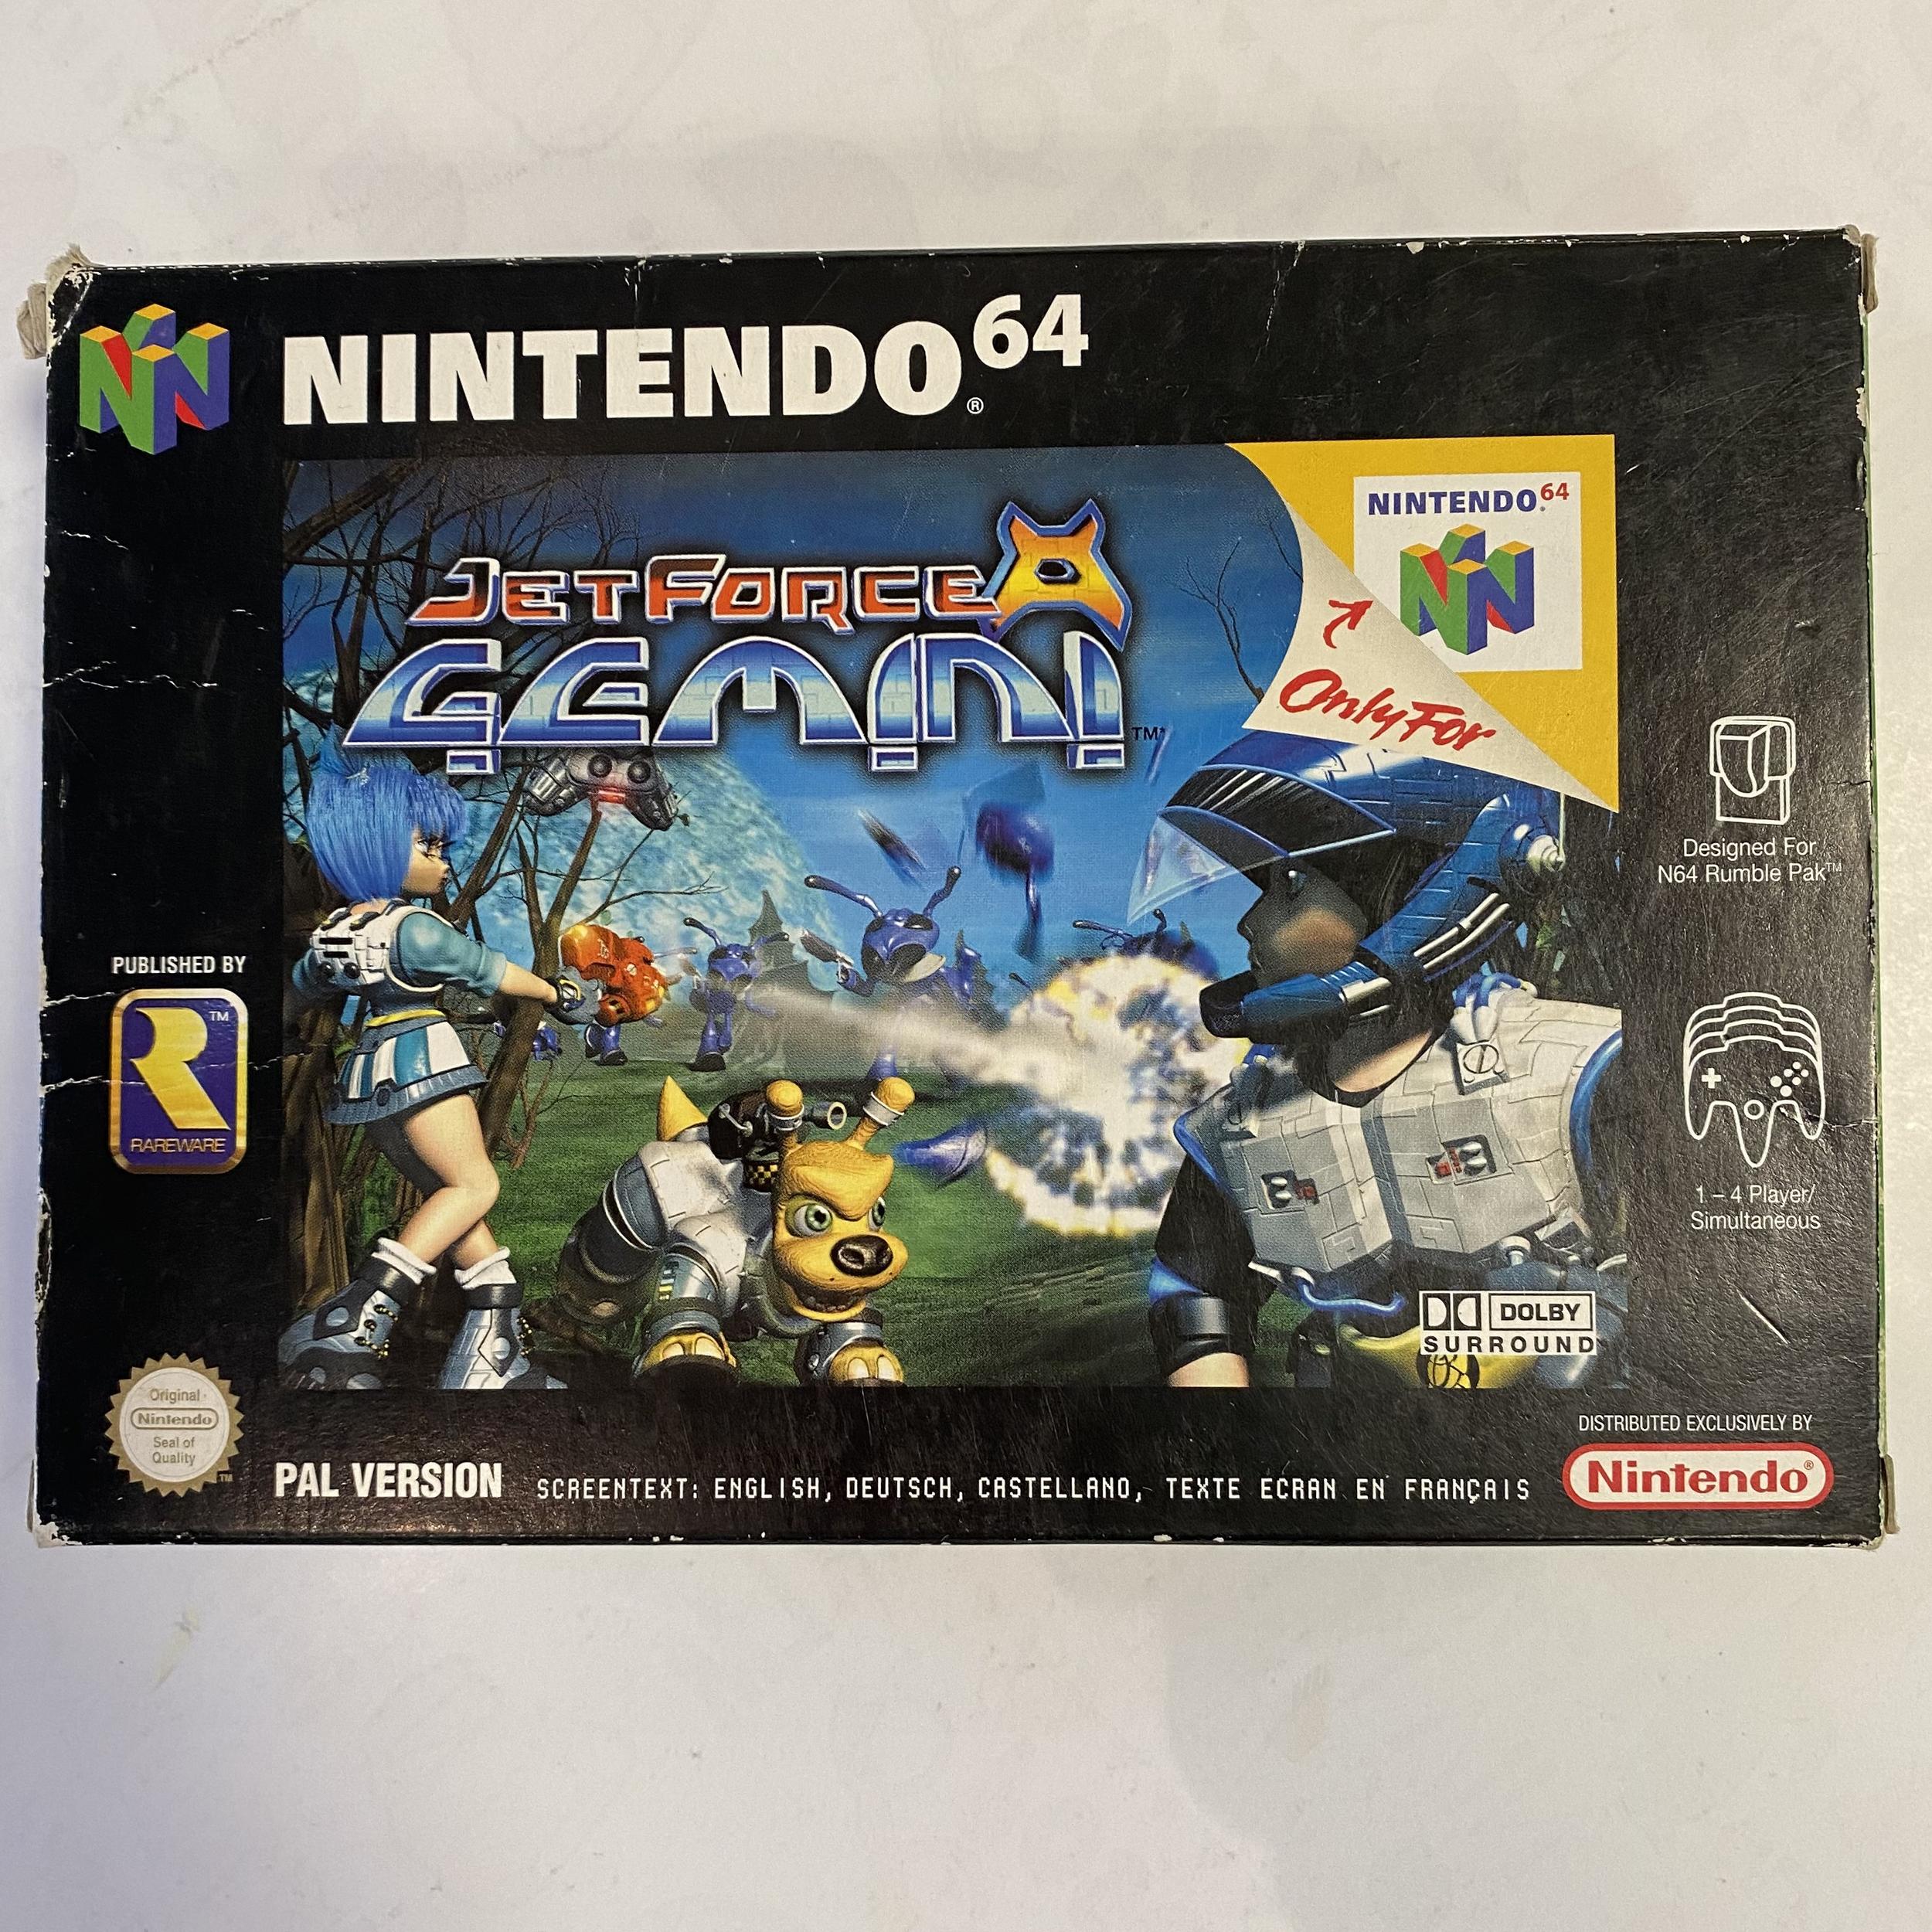 Nintendo 64 - Jet Force Gemini occasion